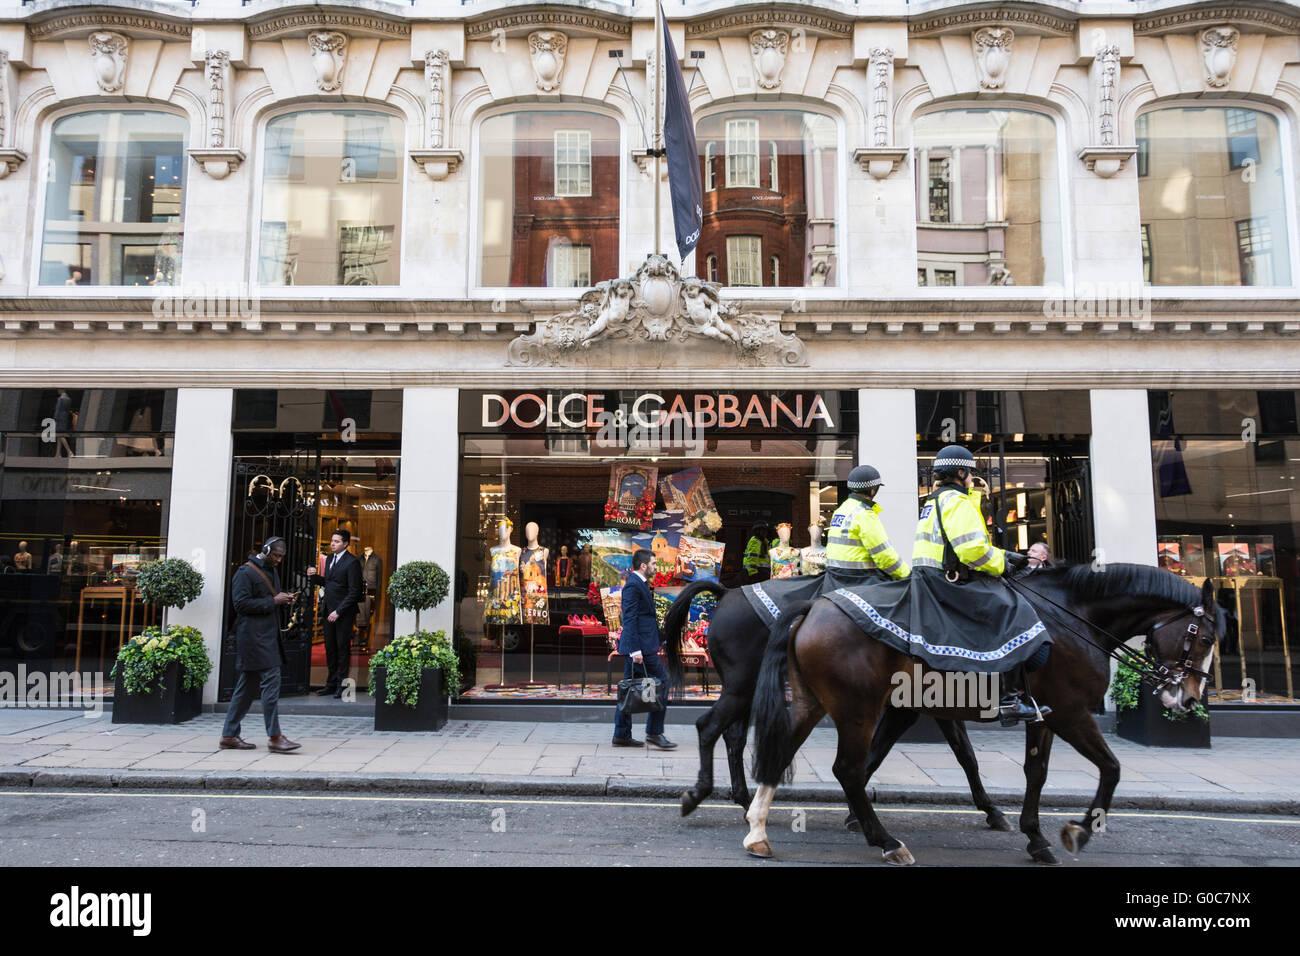 The Dolce & Gabbana store on Old Bond Street, London - Stock Image